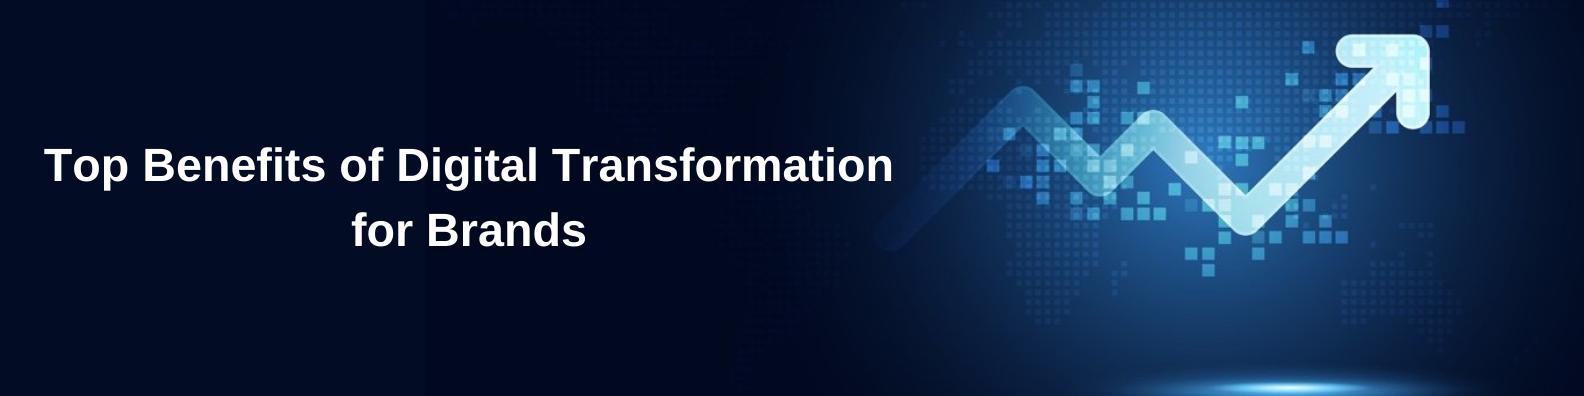 Top Benefits of Digital Transformation for Brands